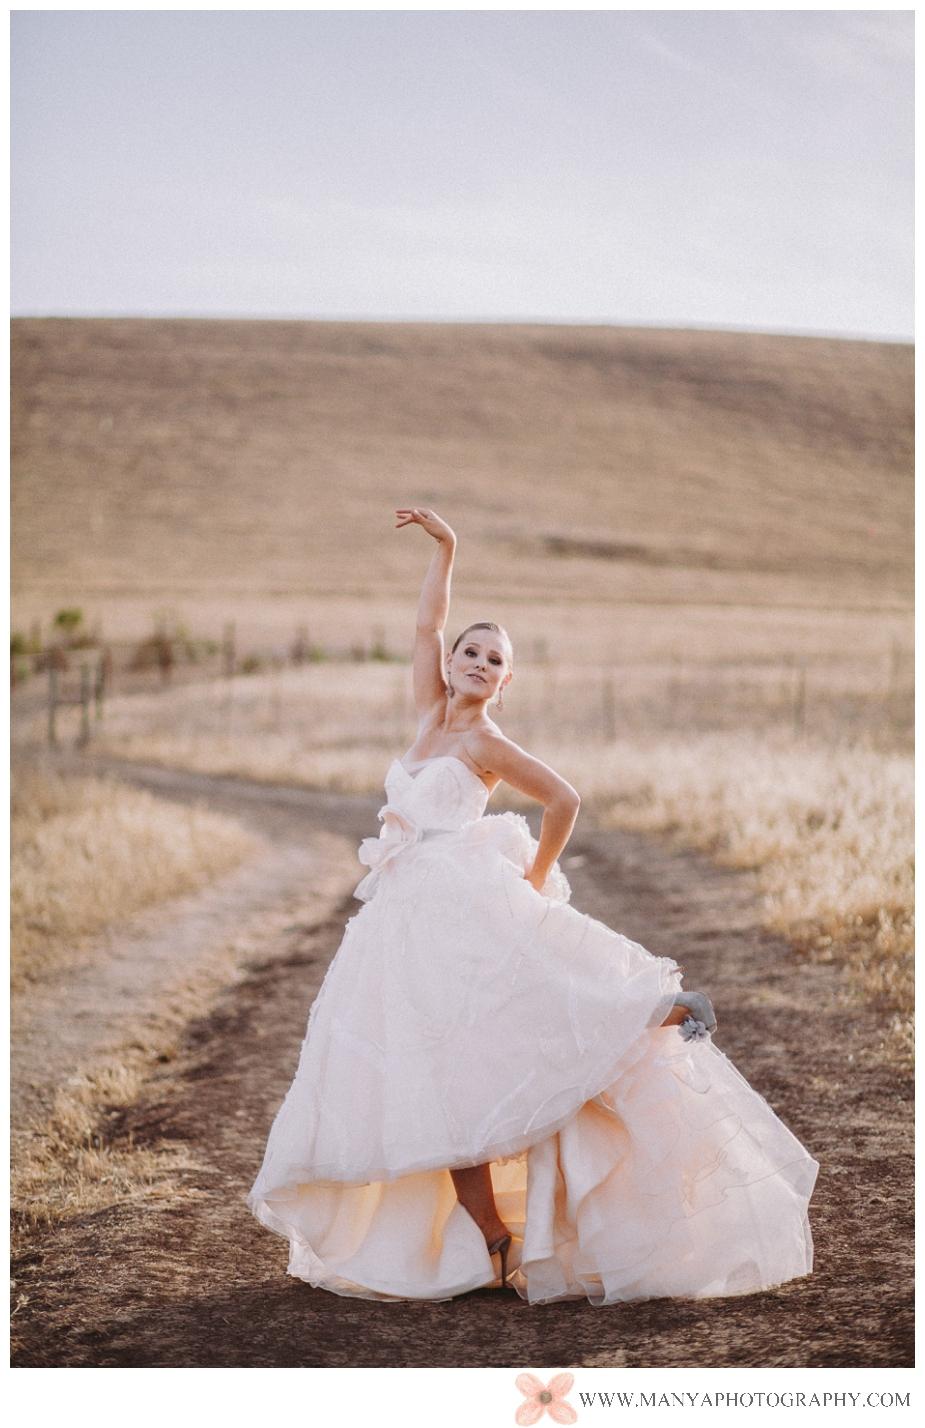 2013-07-24_0033 - Orange County Wedding Photographer